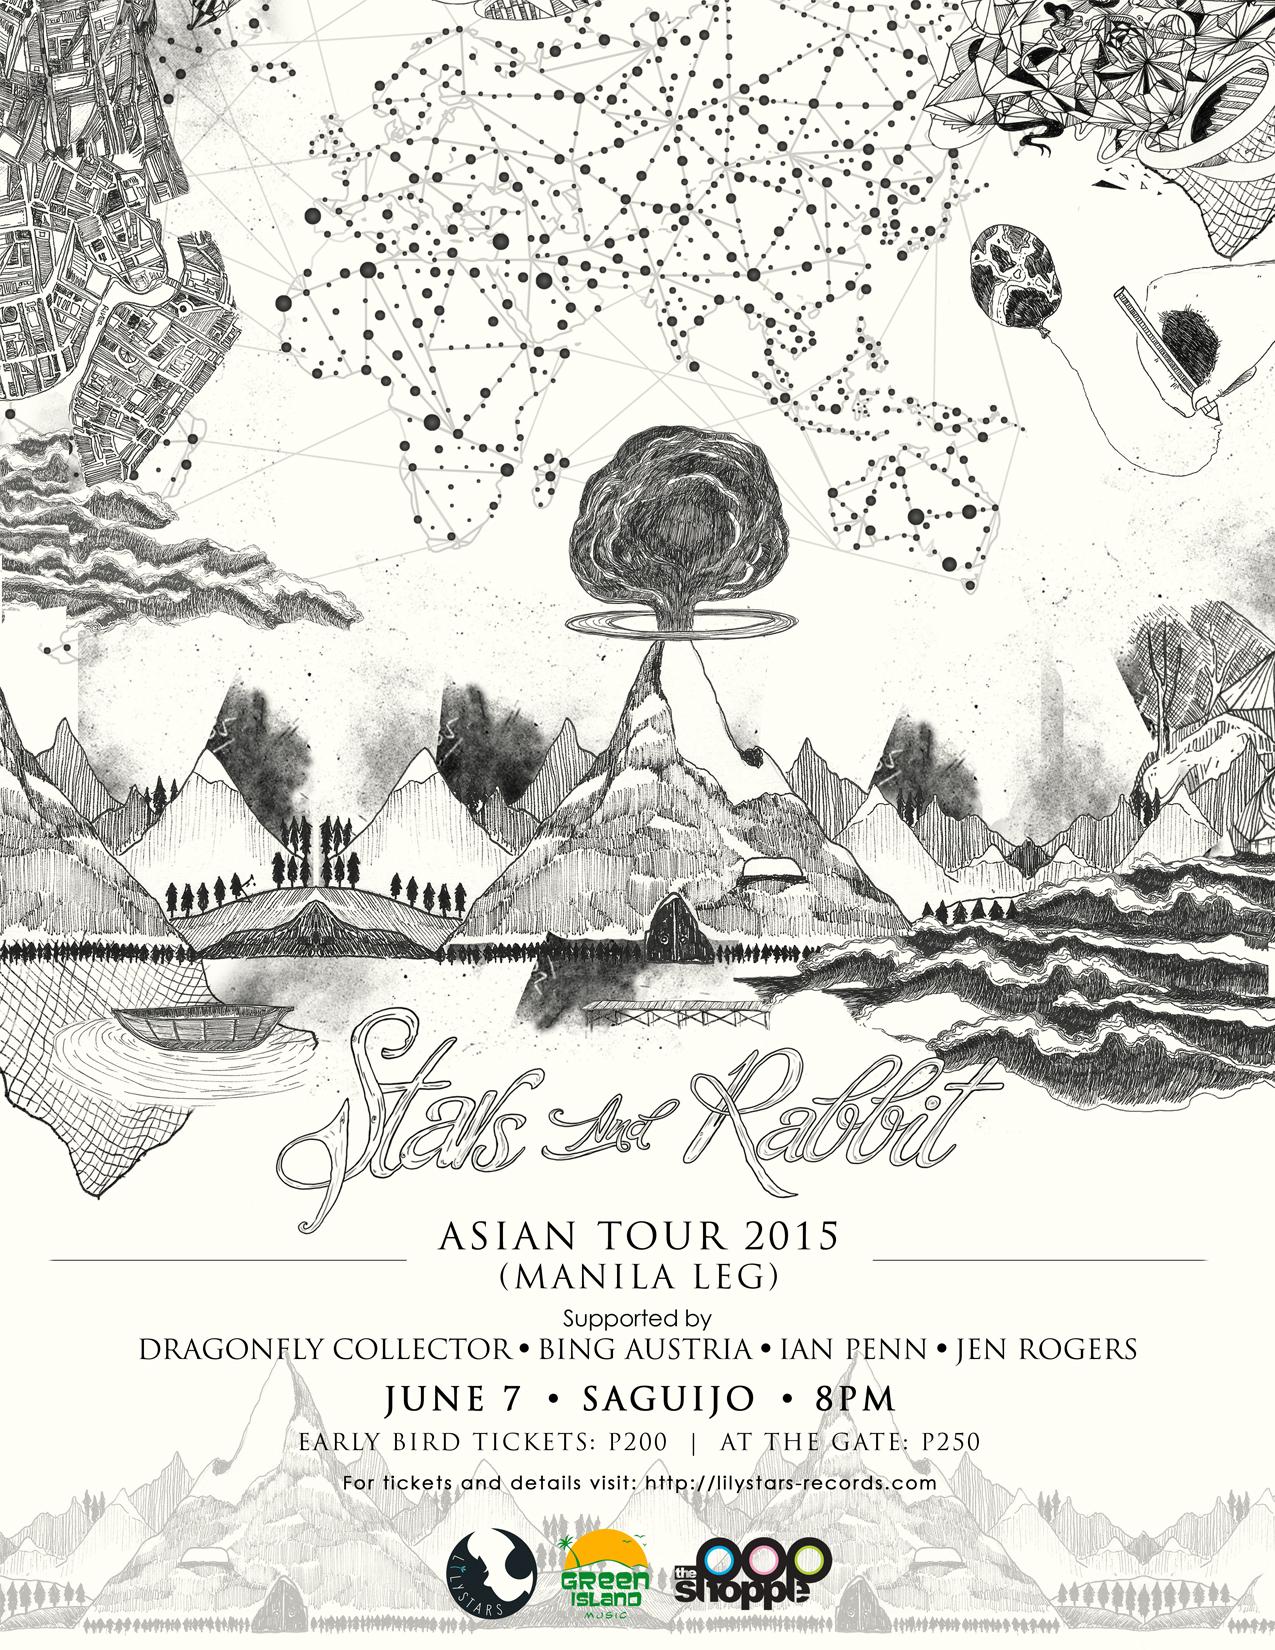 Stars and Rabbit Asian Tour 2015 (Manila Leg)